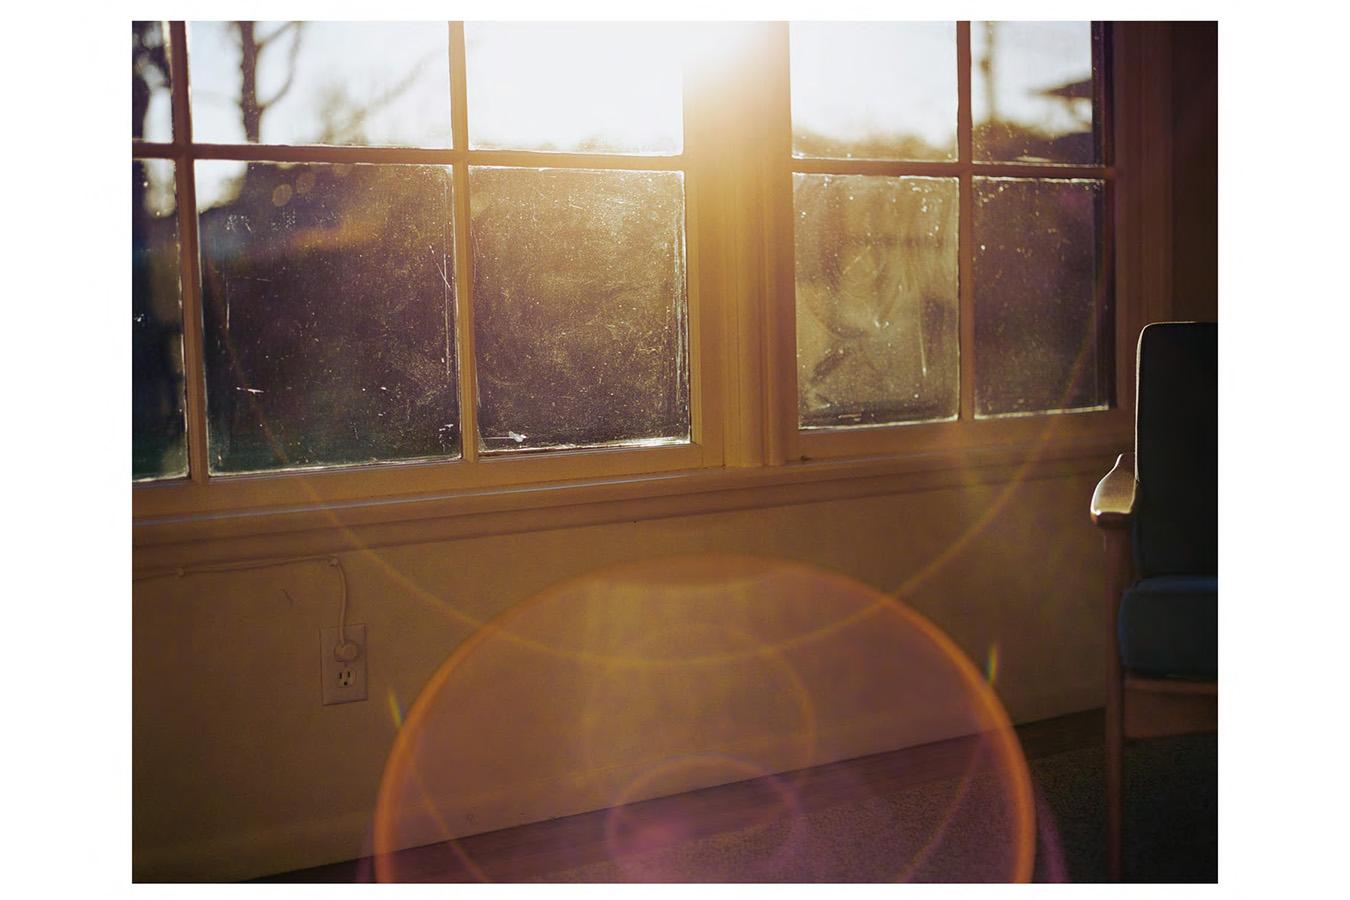 Uta Barth nowhere near (99.12) 1999 color photogra...